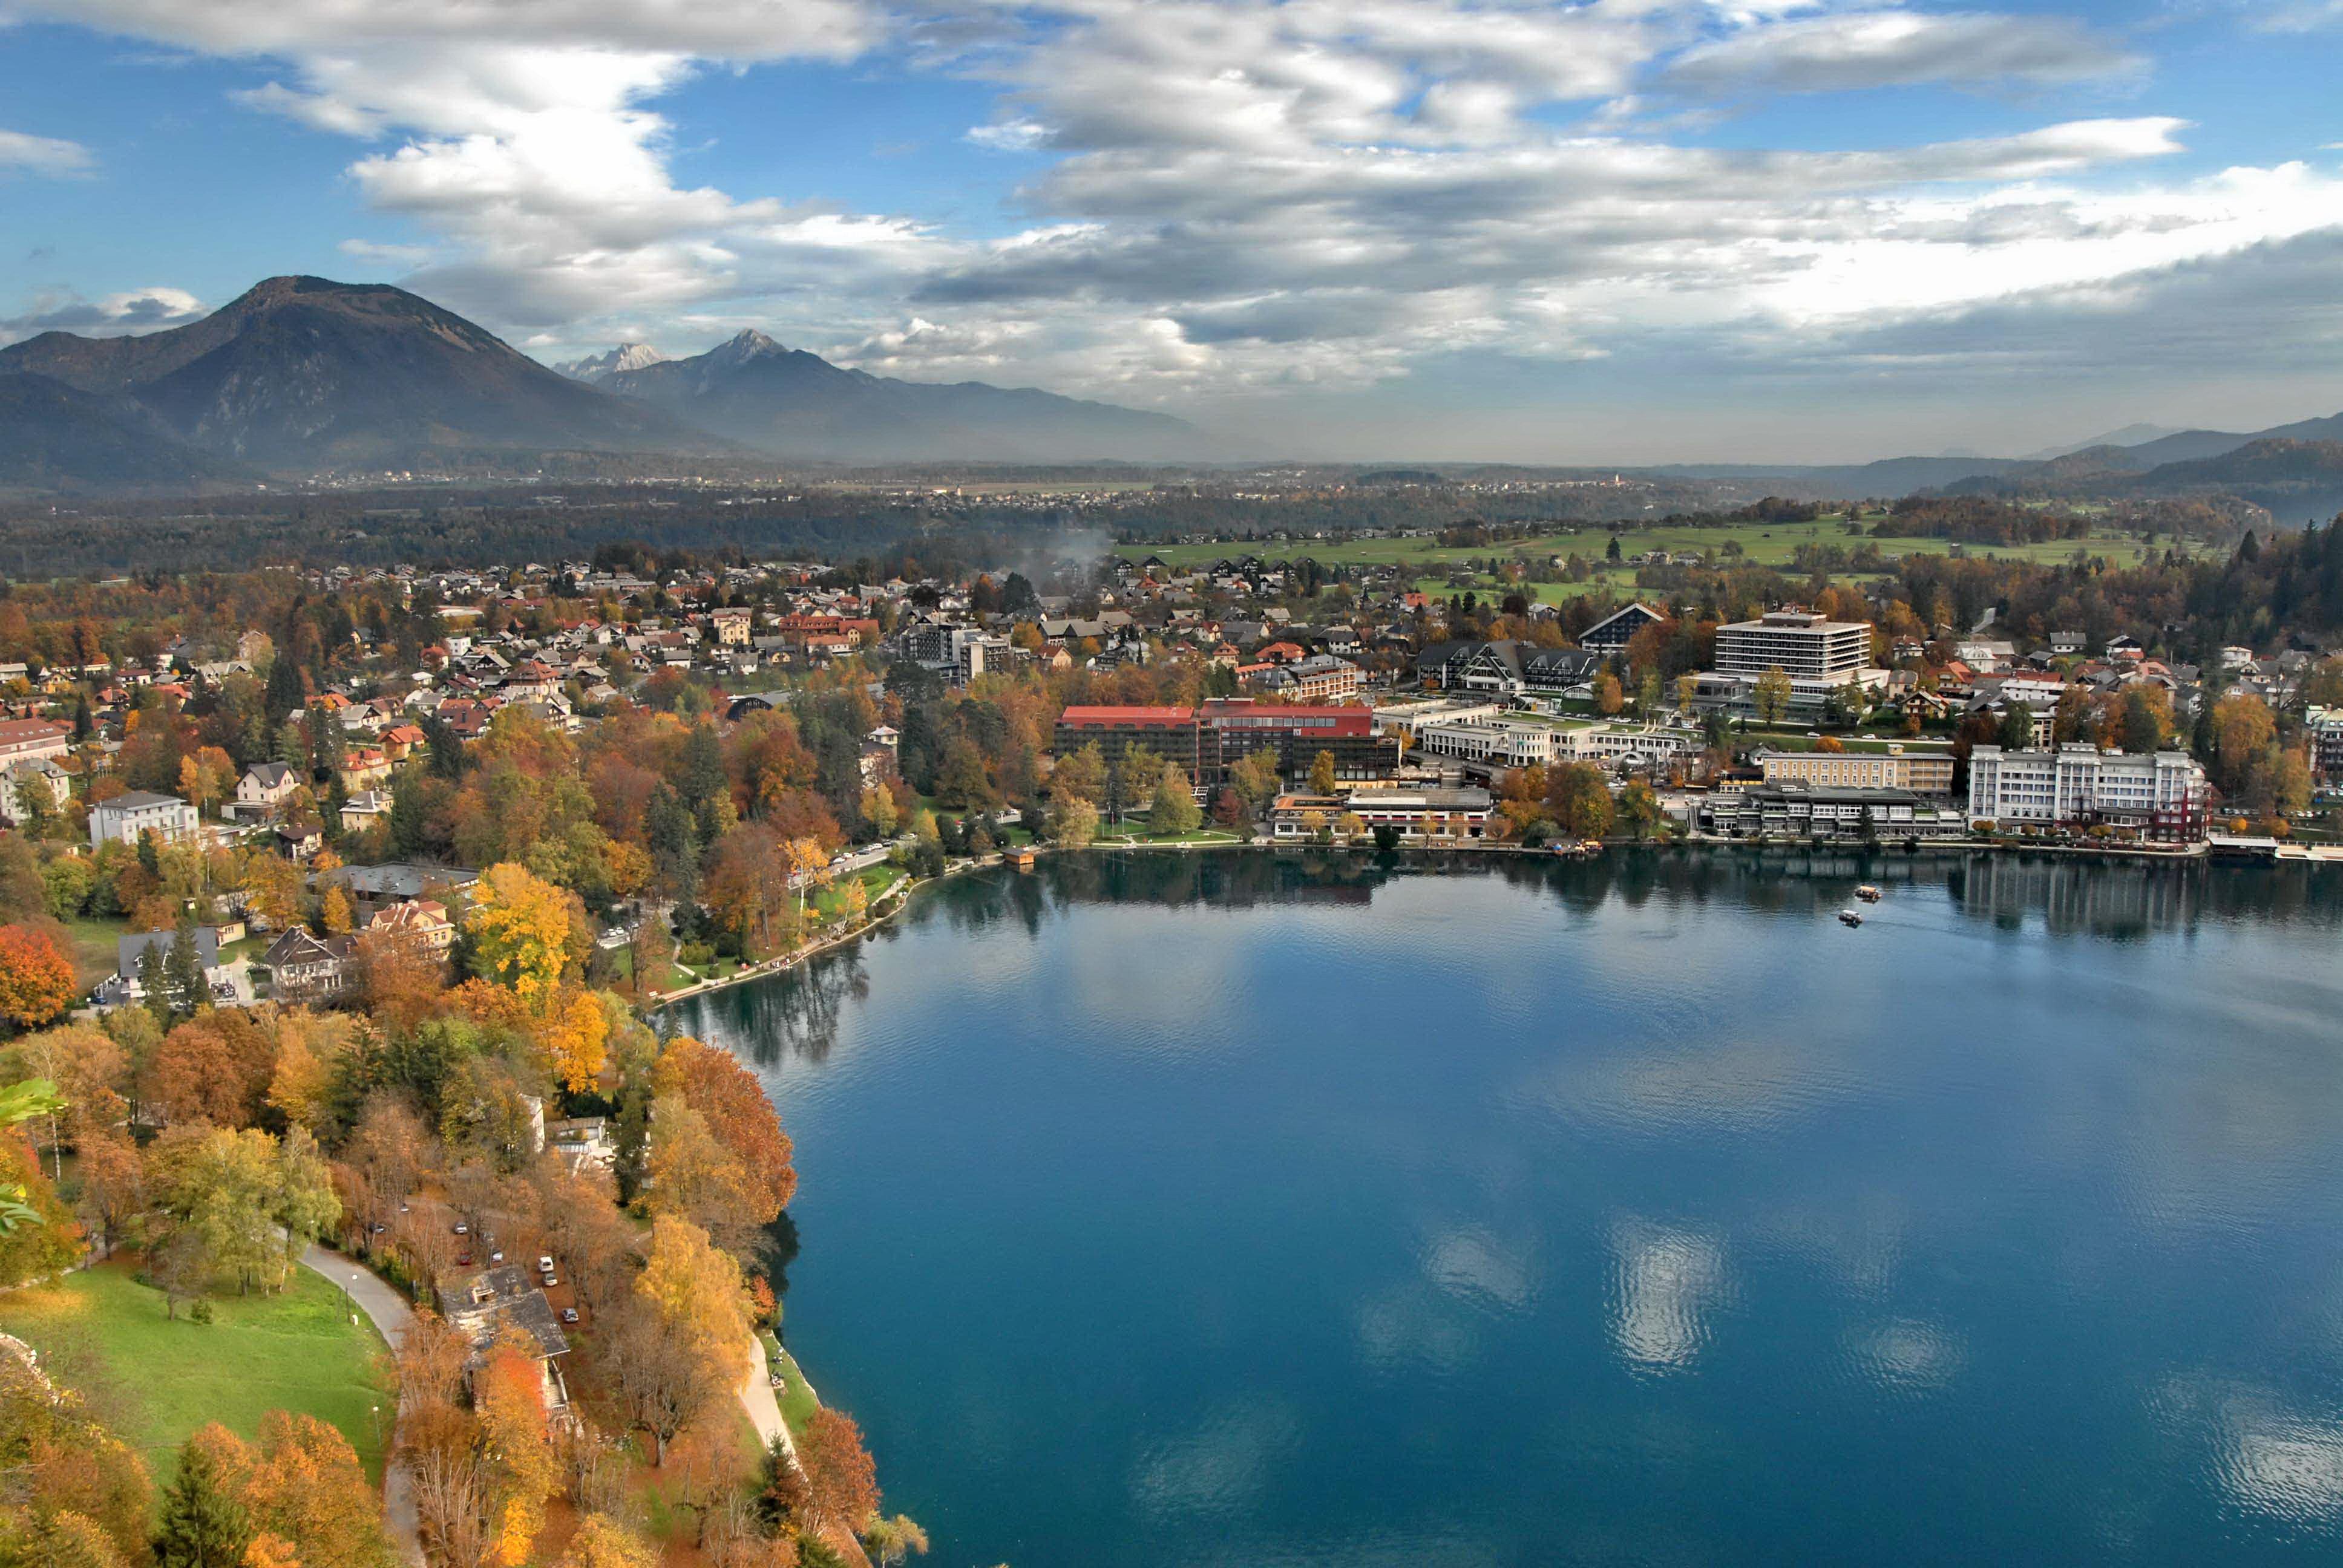 Bled - Wikipedia